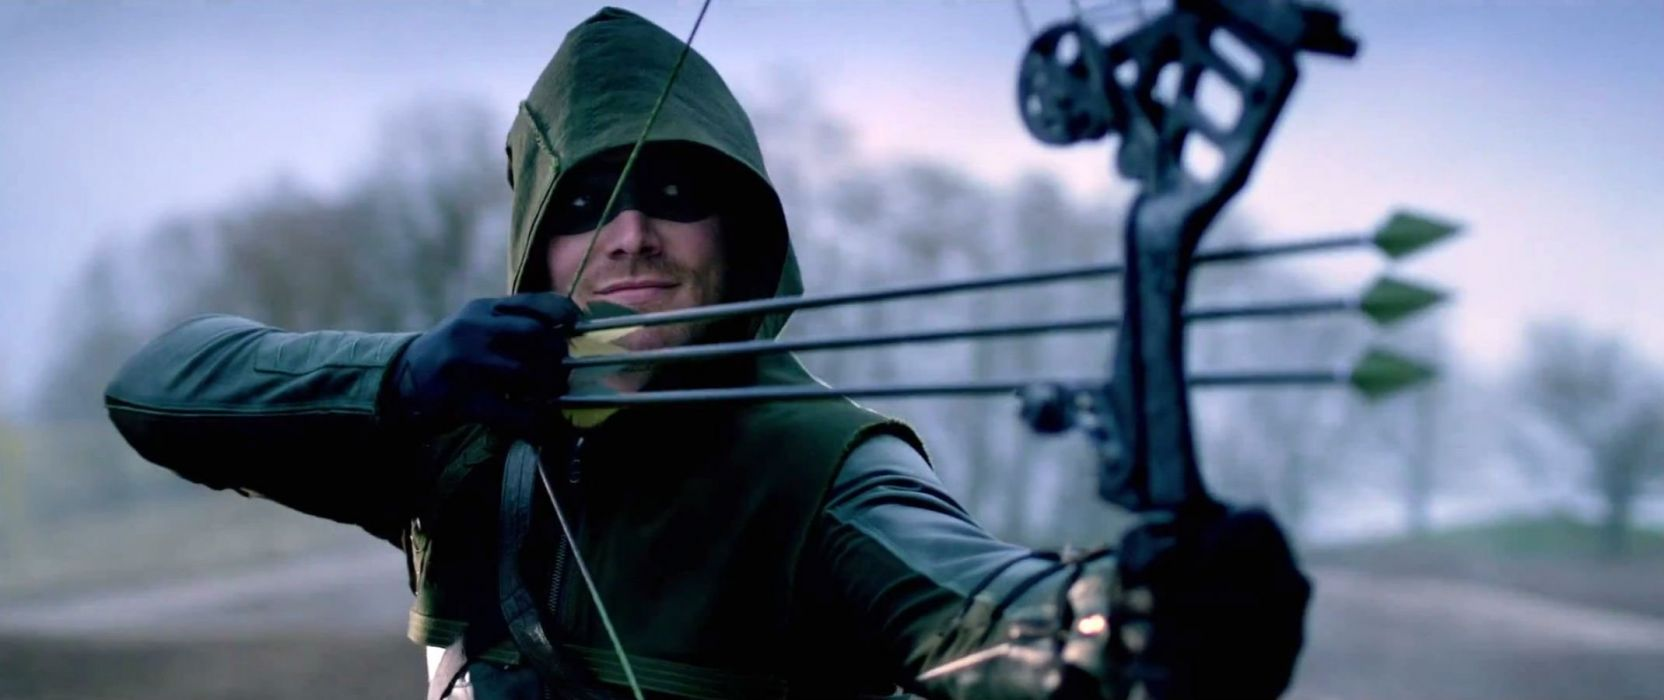 THE FLASH arrow superhero drama action series mystery sci-fi dc-comics comic d-c wallpaper